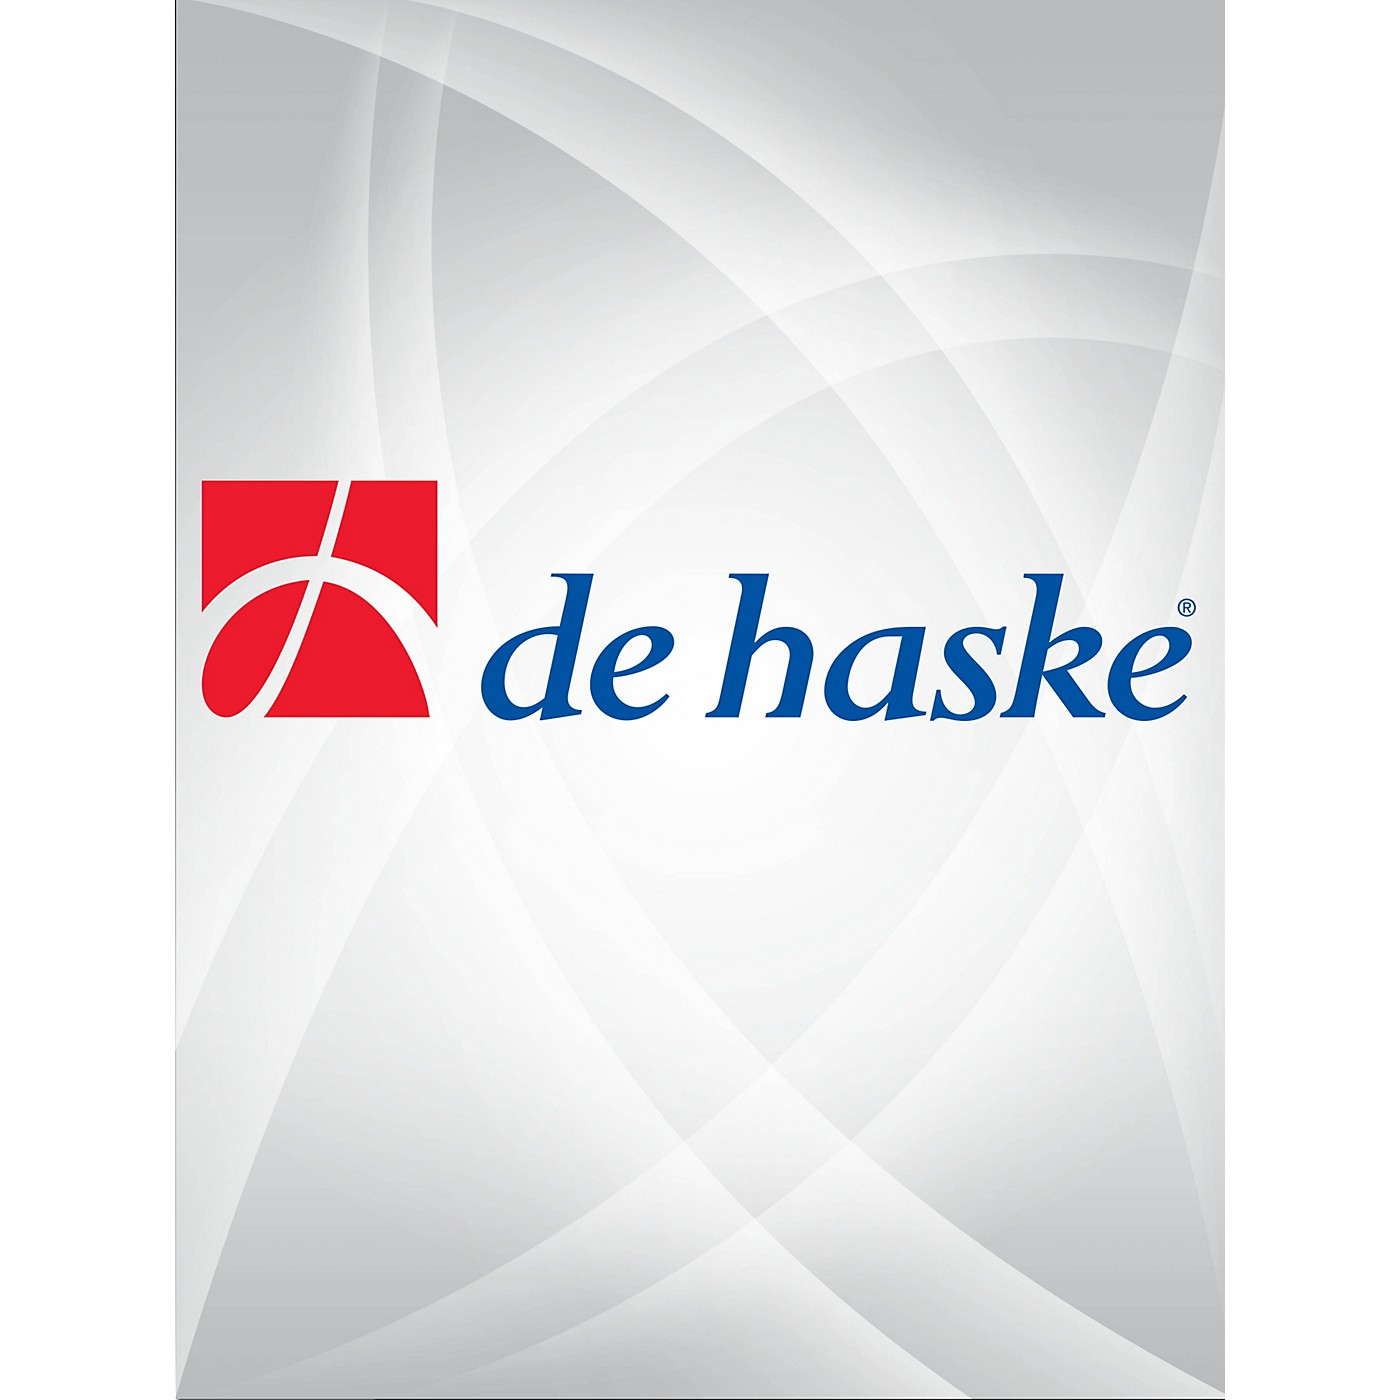 De Haske Music Away in a Manger (Choral Parts) thumbnail